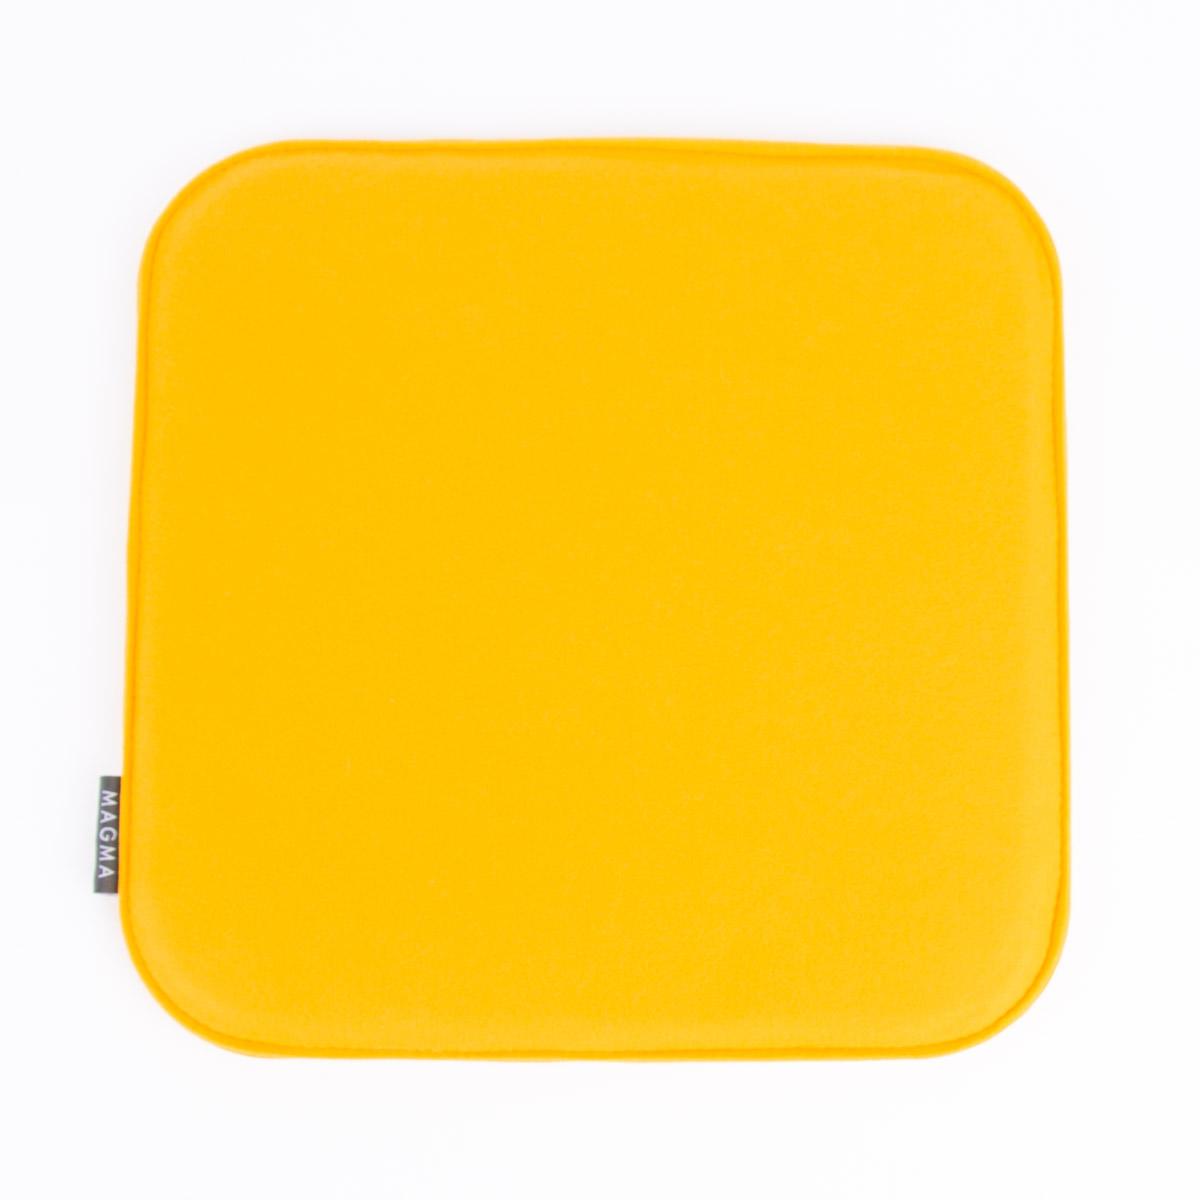 Magma Stuhlkissen AVARO Filz eckig senf gelb 35x35x2cm